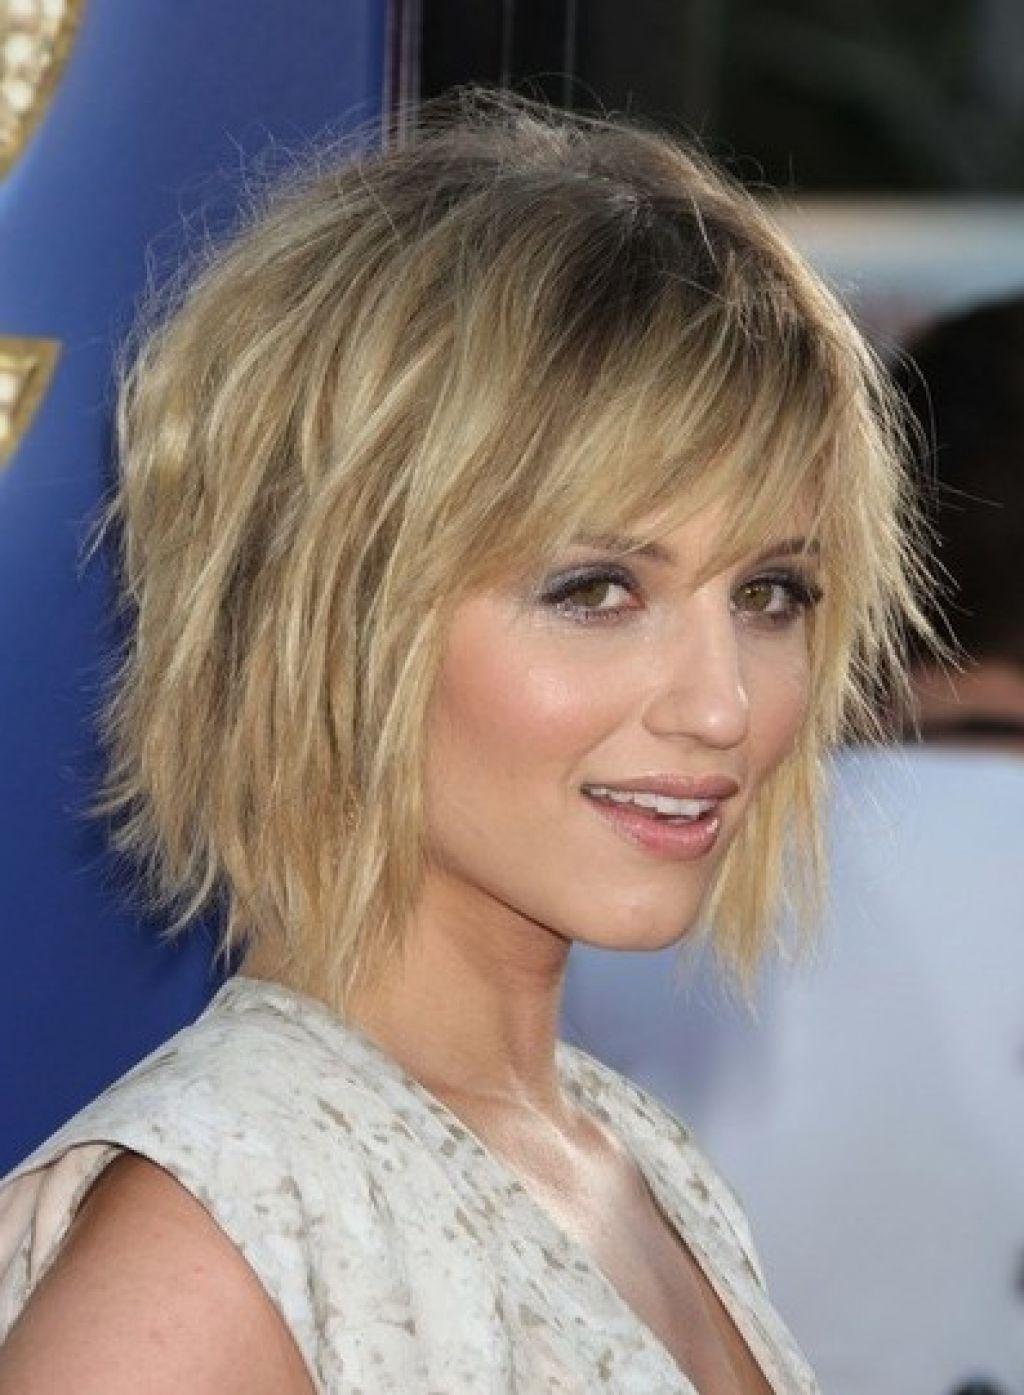 Short Choppy Layered Hair Short Layered Haircuts With Bangs Women